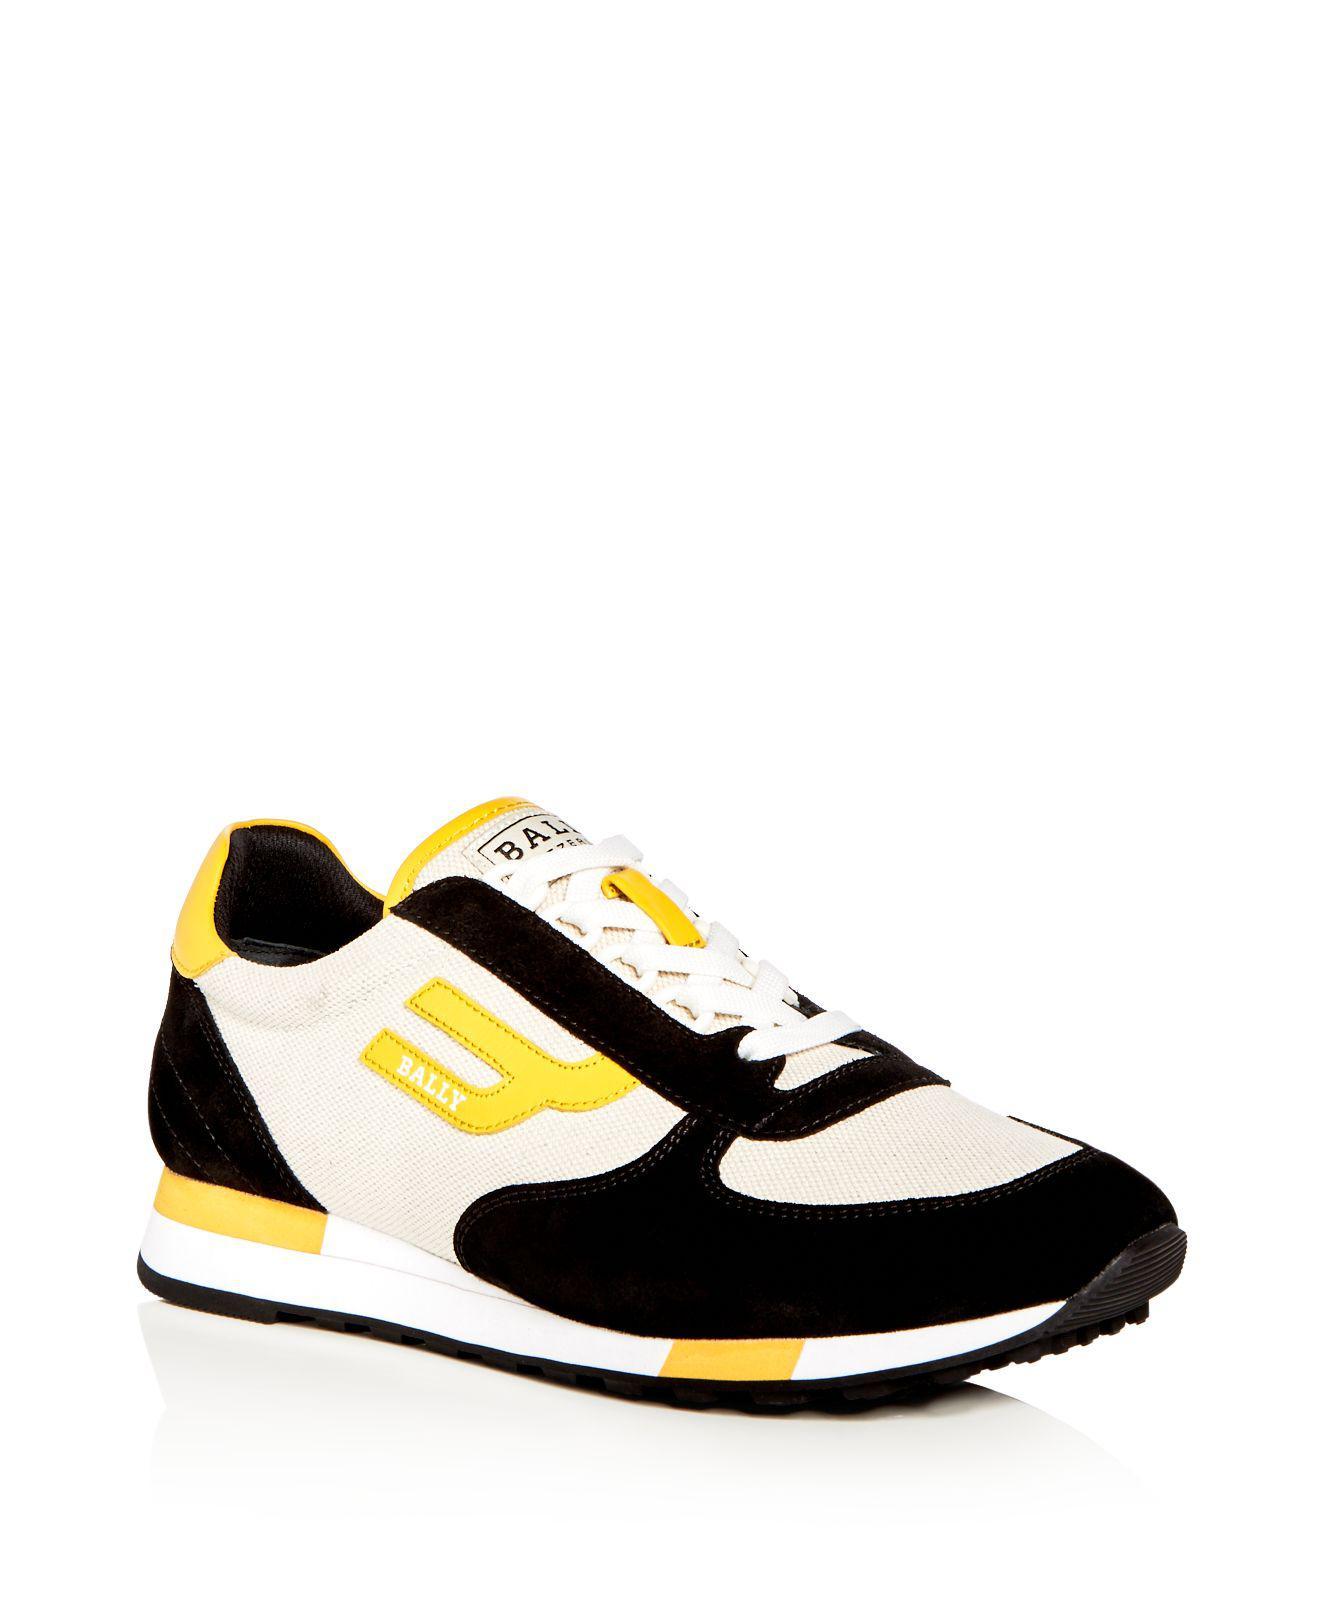 GAVINO - Sneaker low - natural Bester Verkauf Günstiger Preis 58yjxI